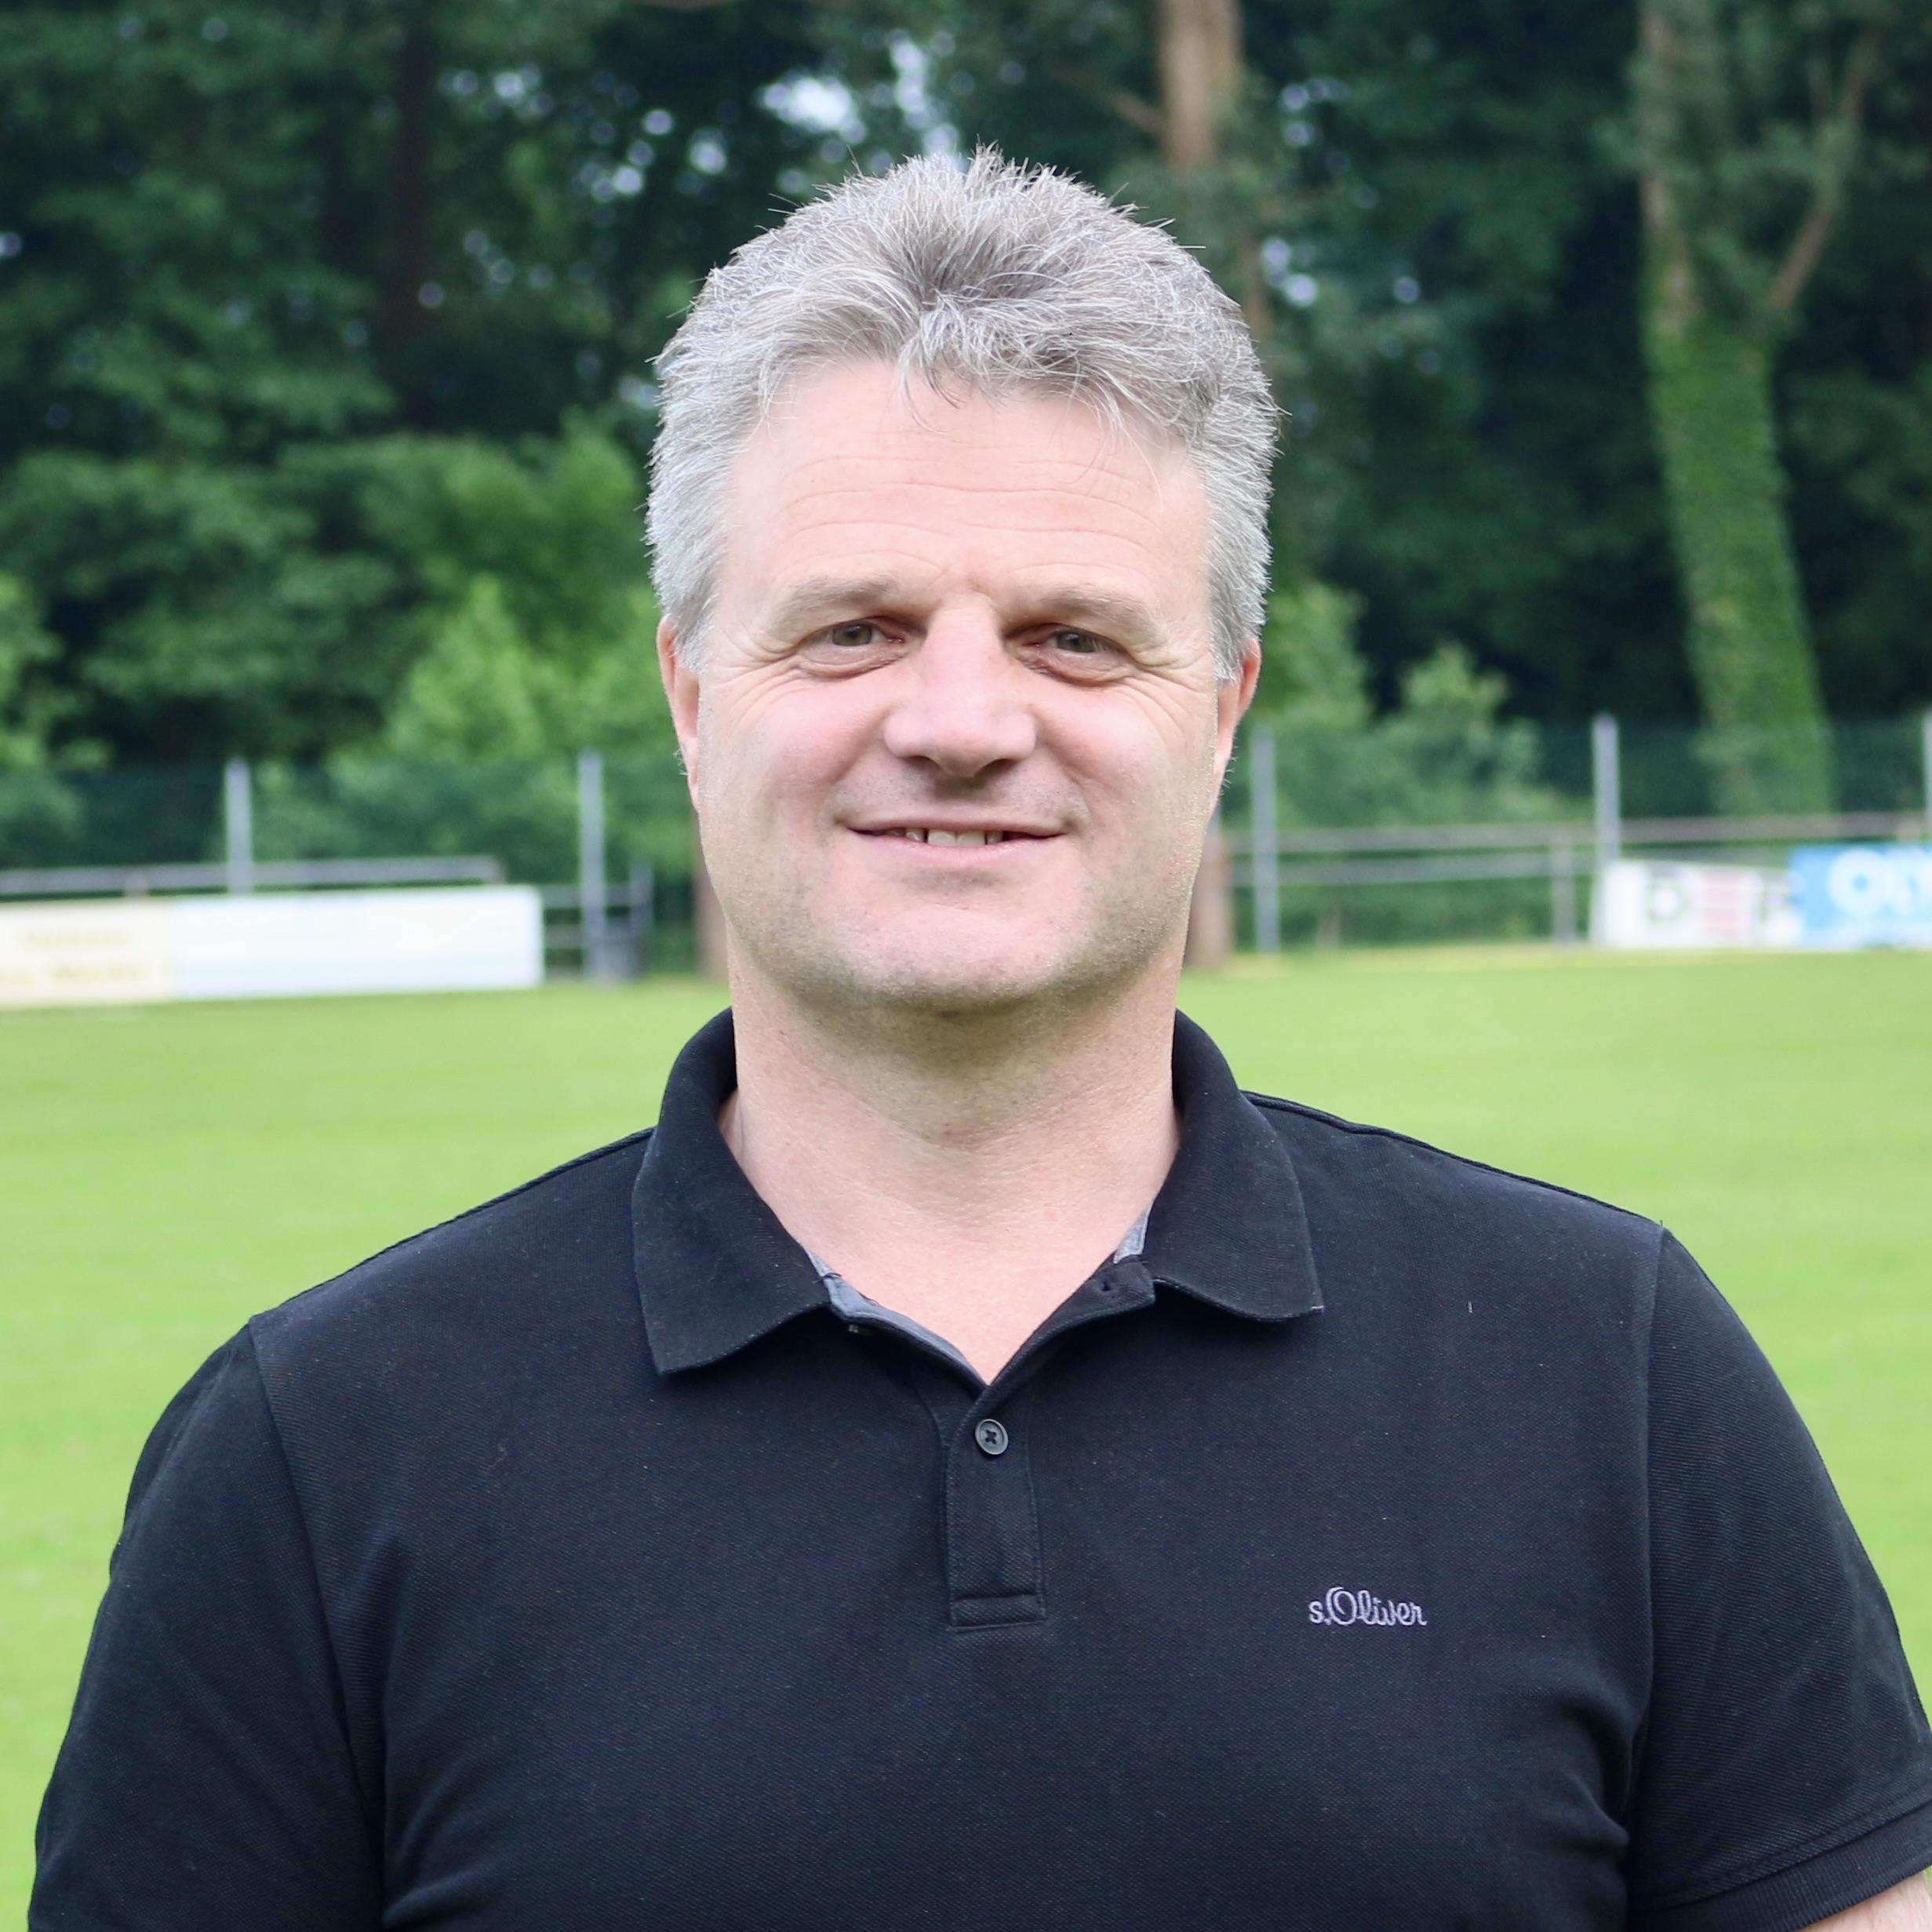 Jürgen Kuite